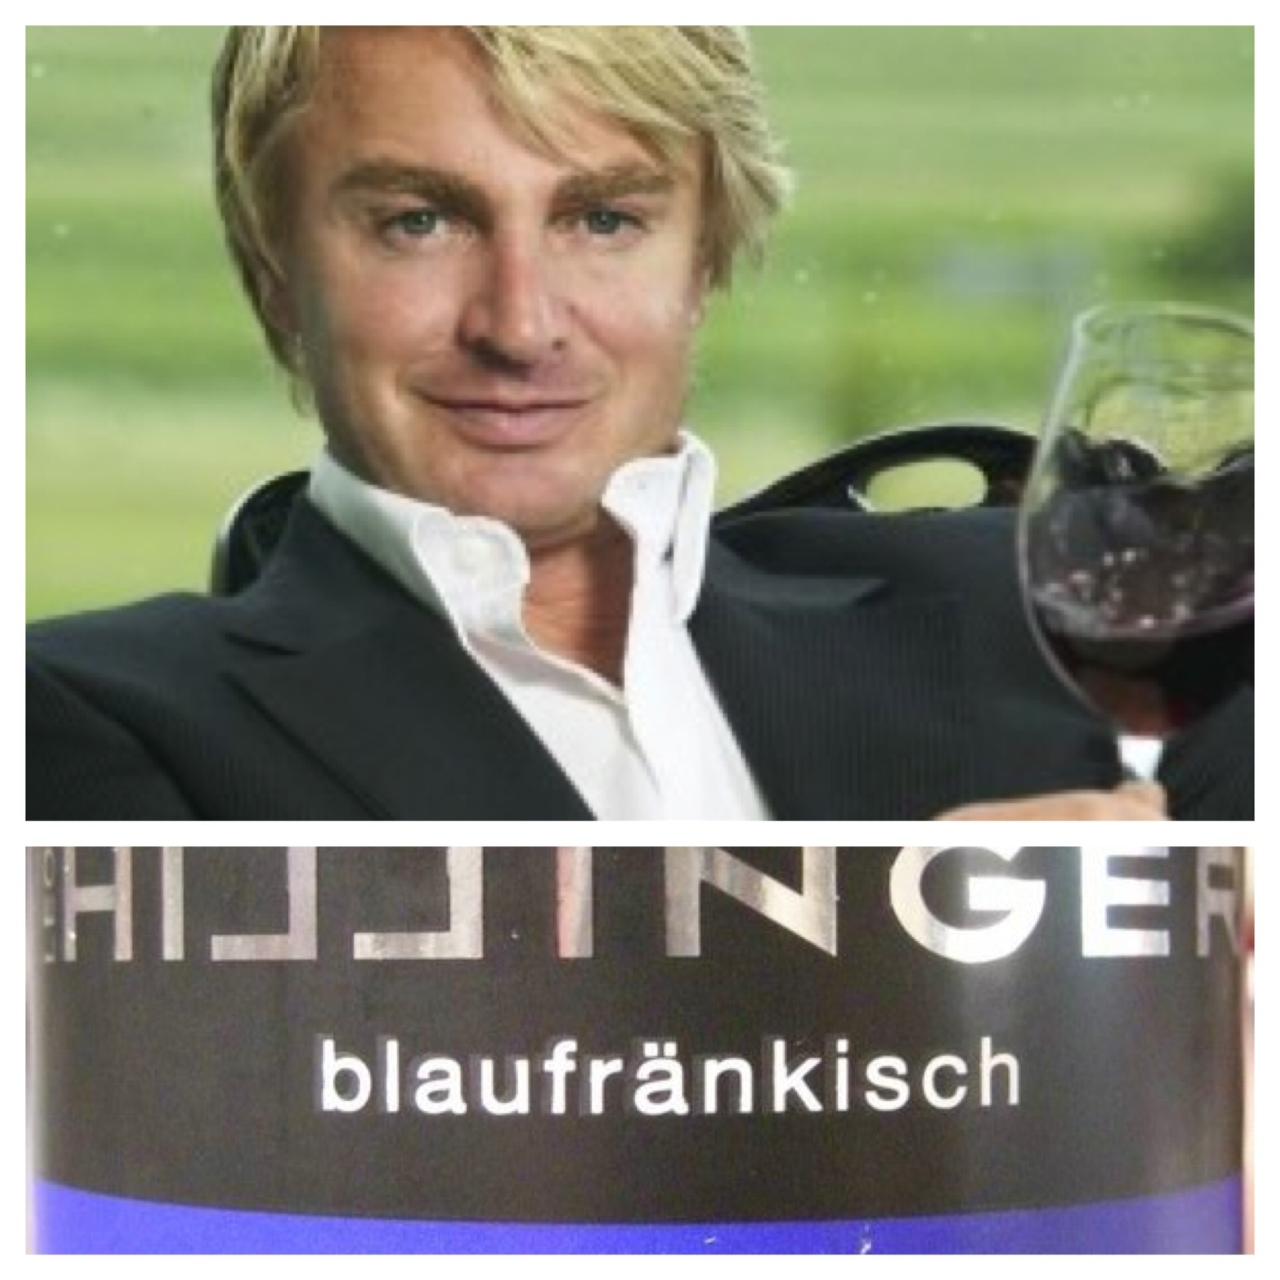 Leo Hillinger and his Blaufrankisch